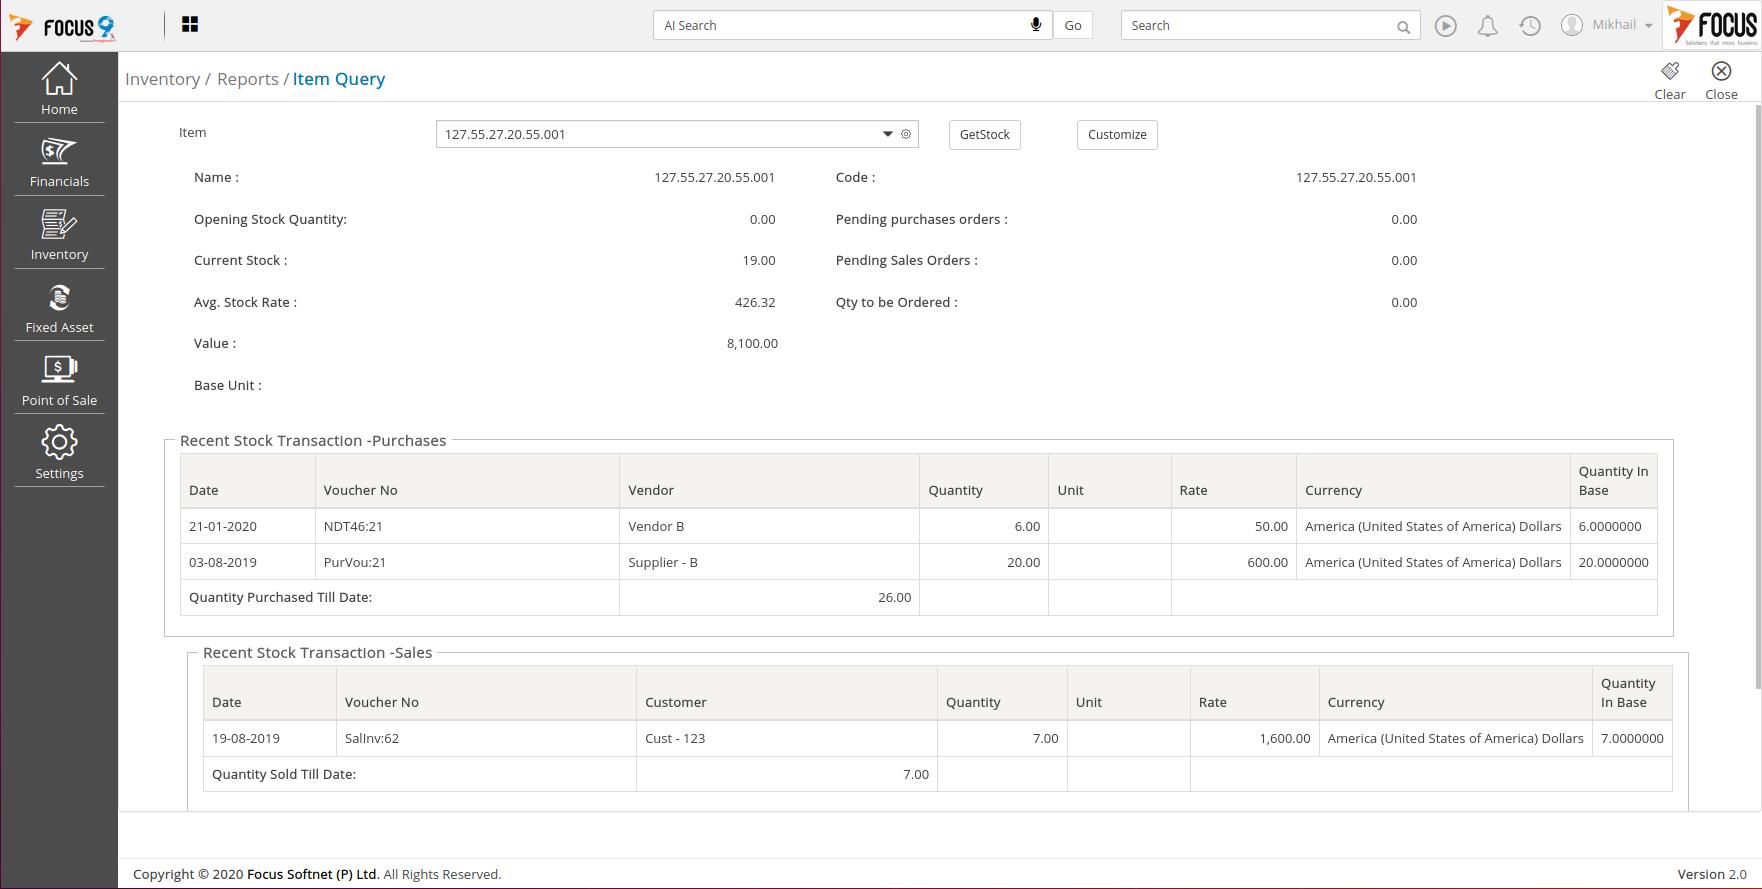 Focus 9 Software - FOCUS9 ERP Inventory Look-up